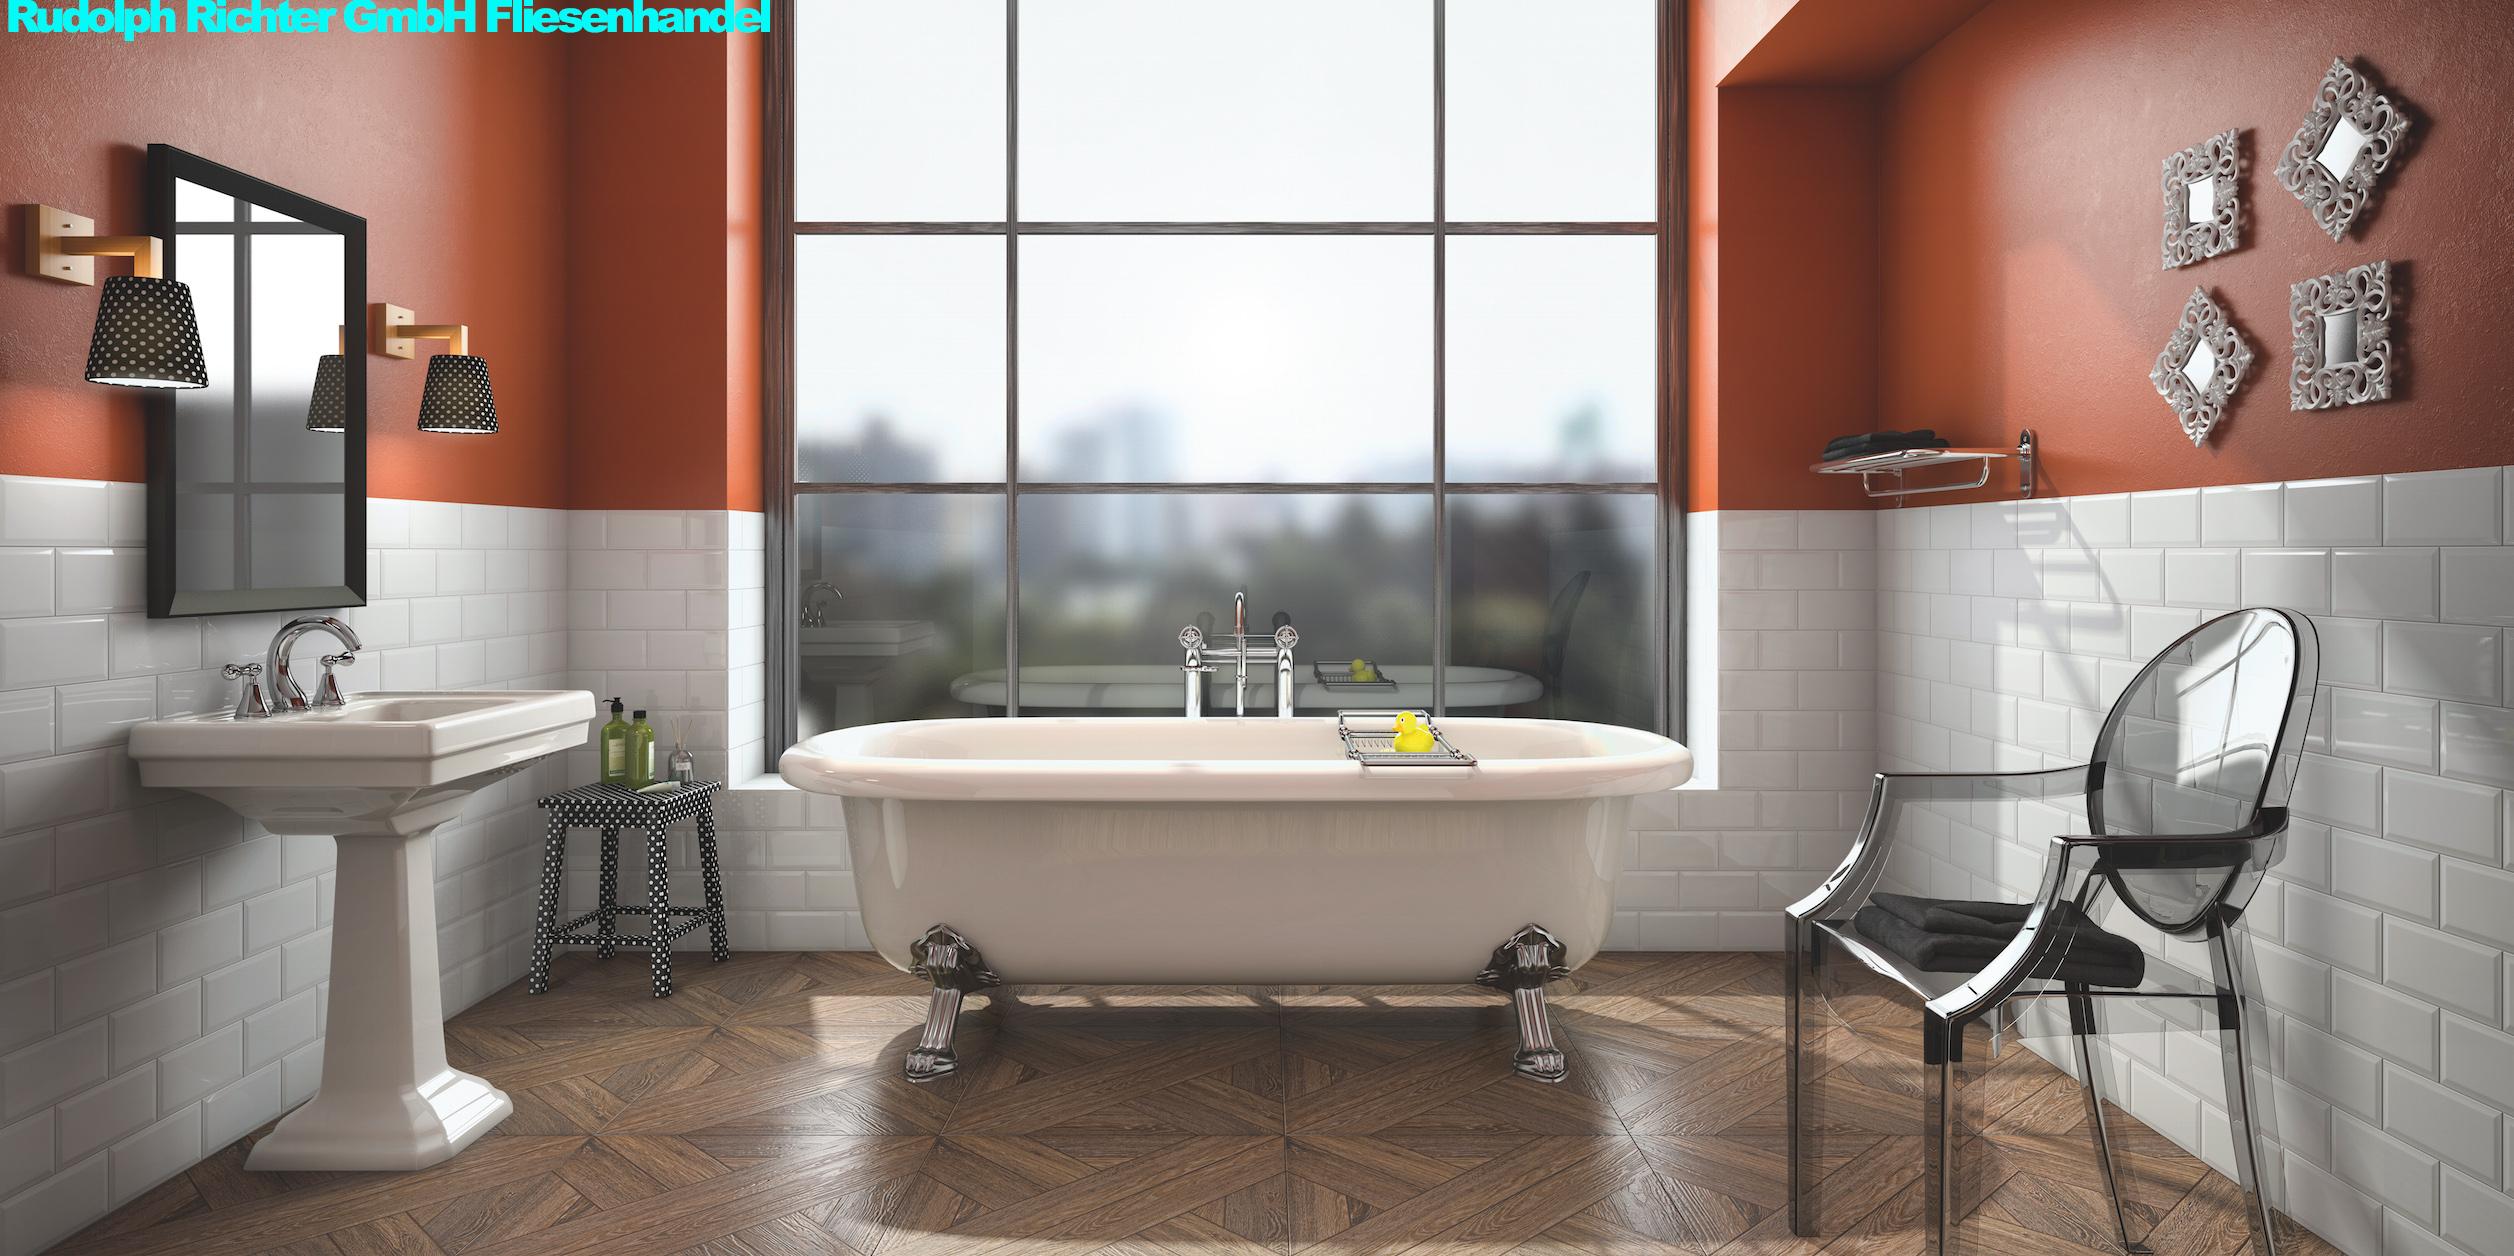 metrofliesen mini midi maxi rudolph richter fliesenhandel iserlohn essen. Black Bedroom Furniture Sets. Home Design Ideas